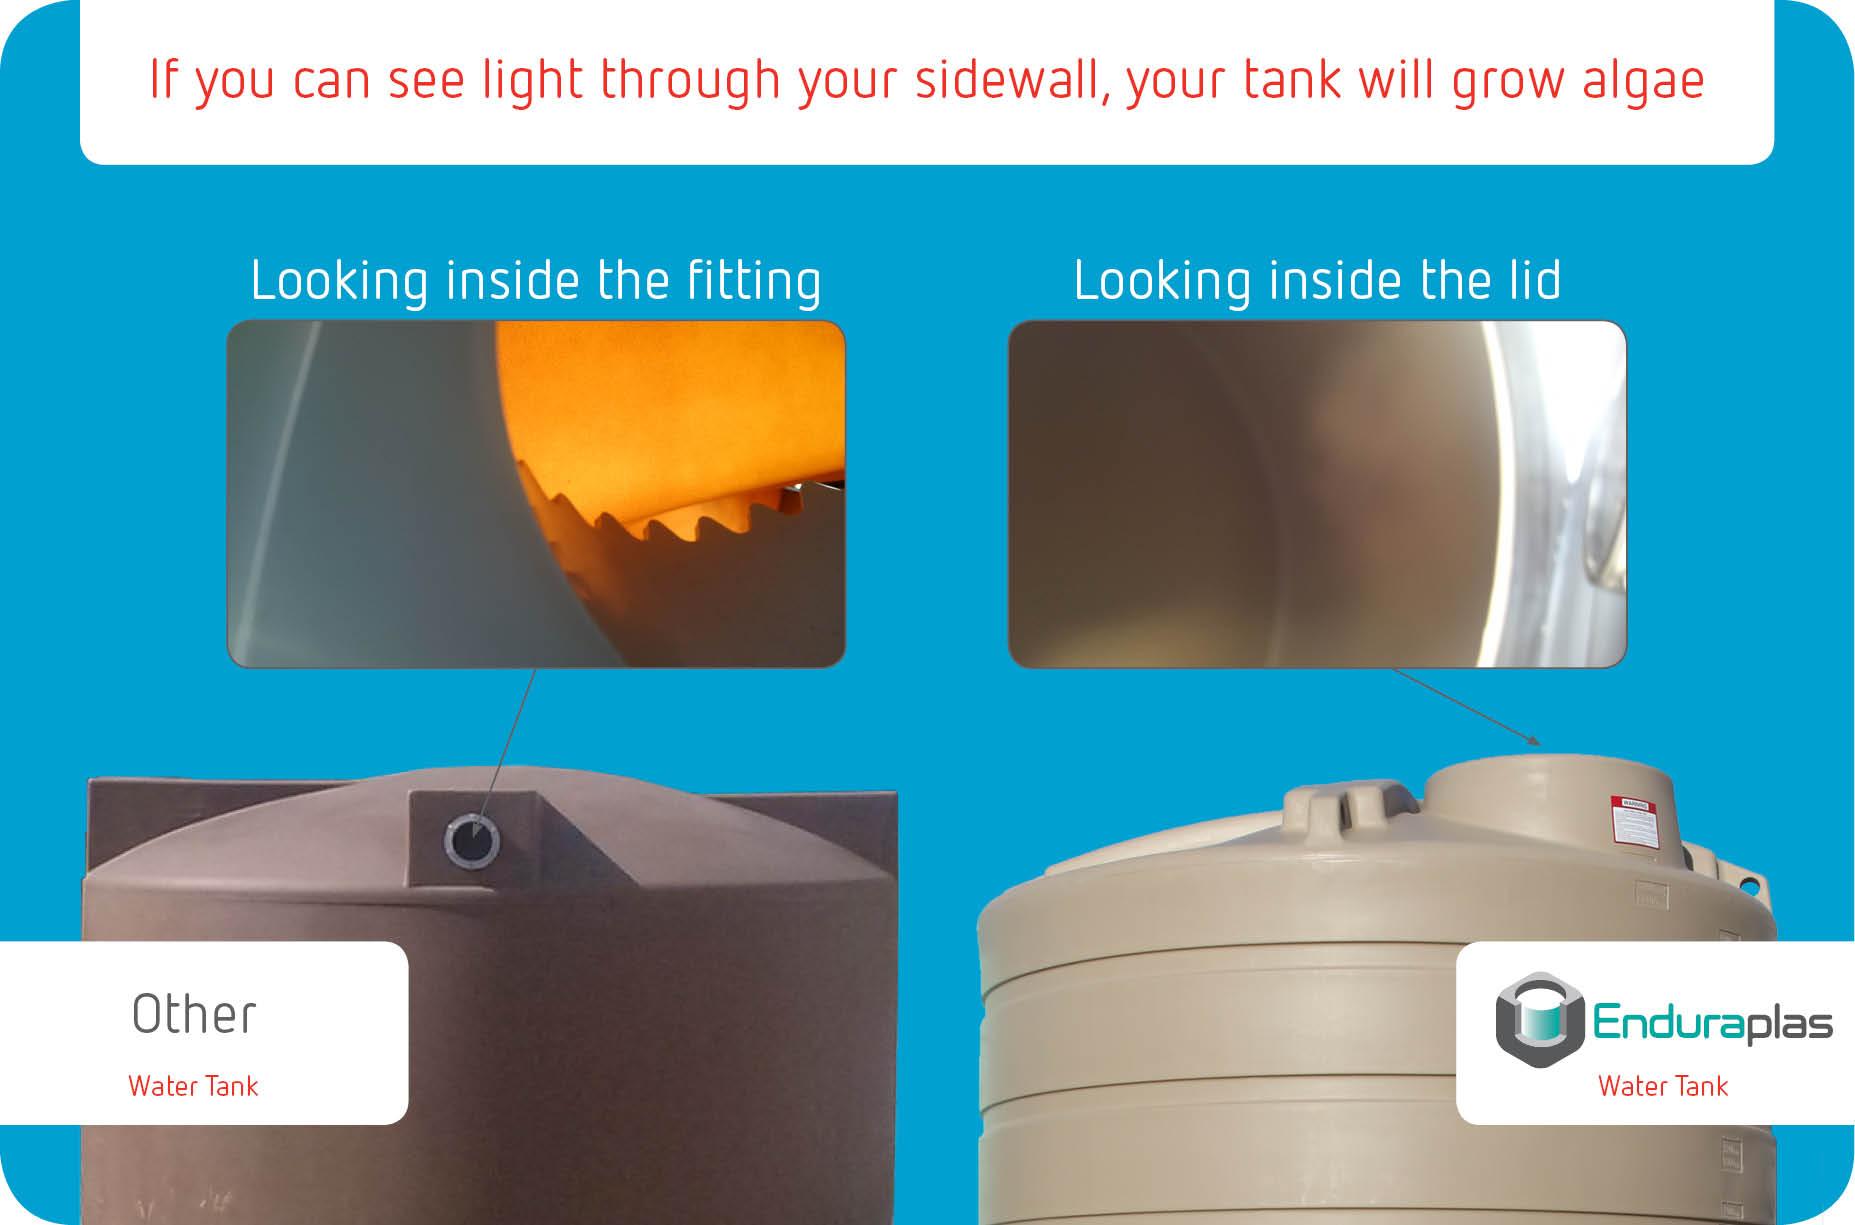 Water-tank-comparison-info-graphic1.jpg